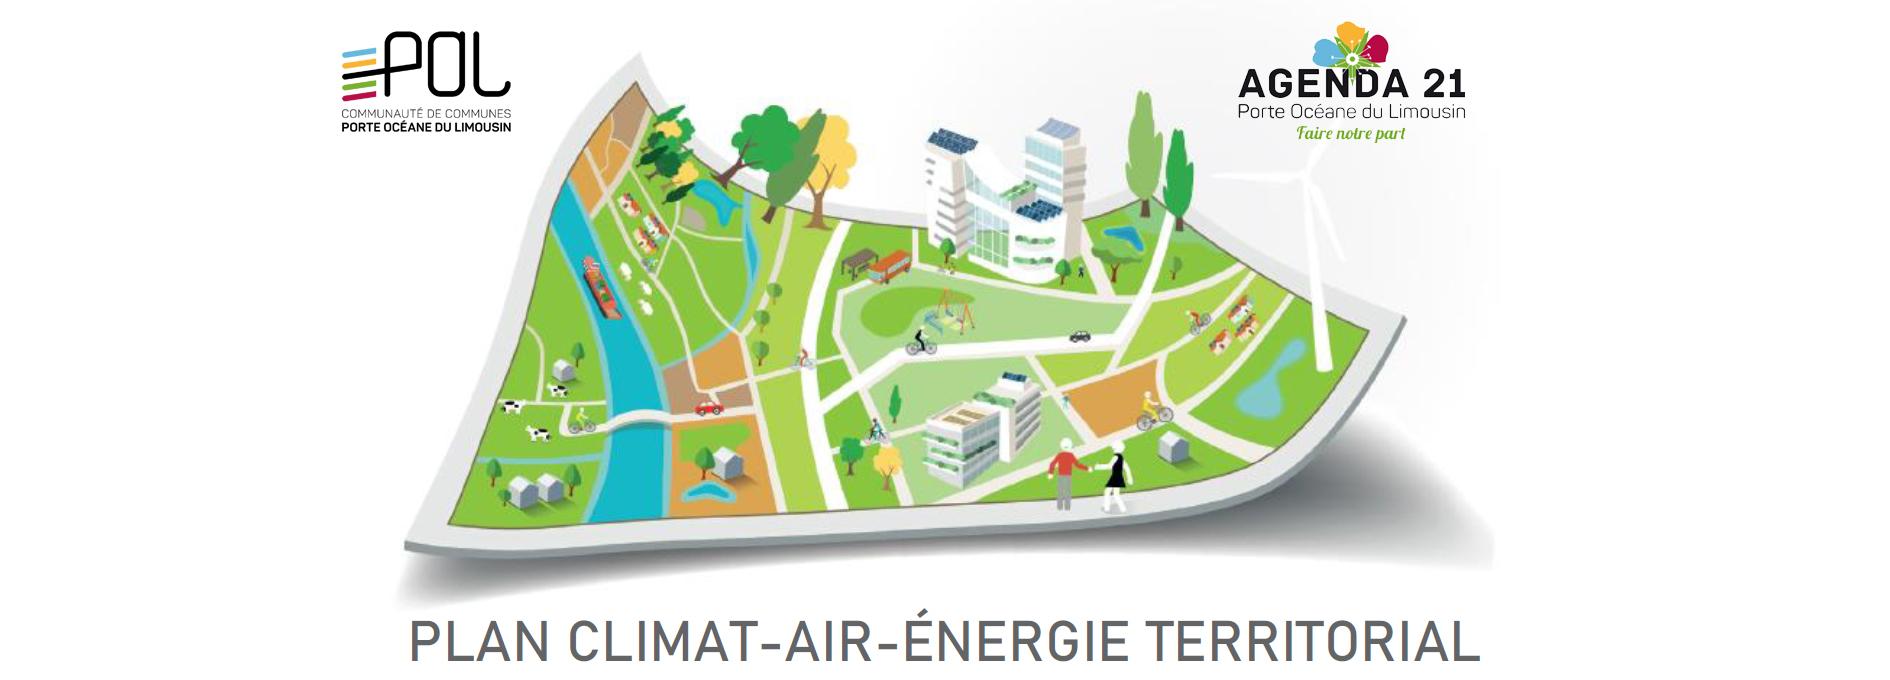 Plan Climat-Air-Energie Territorial